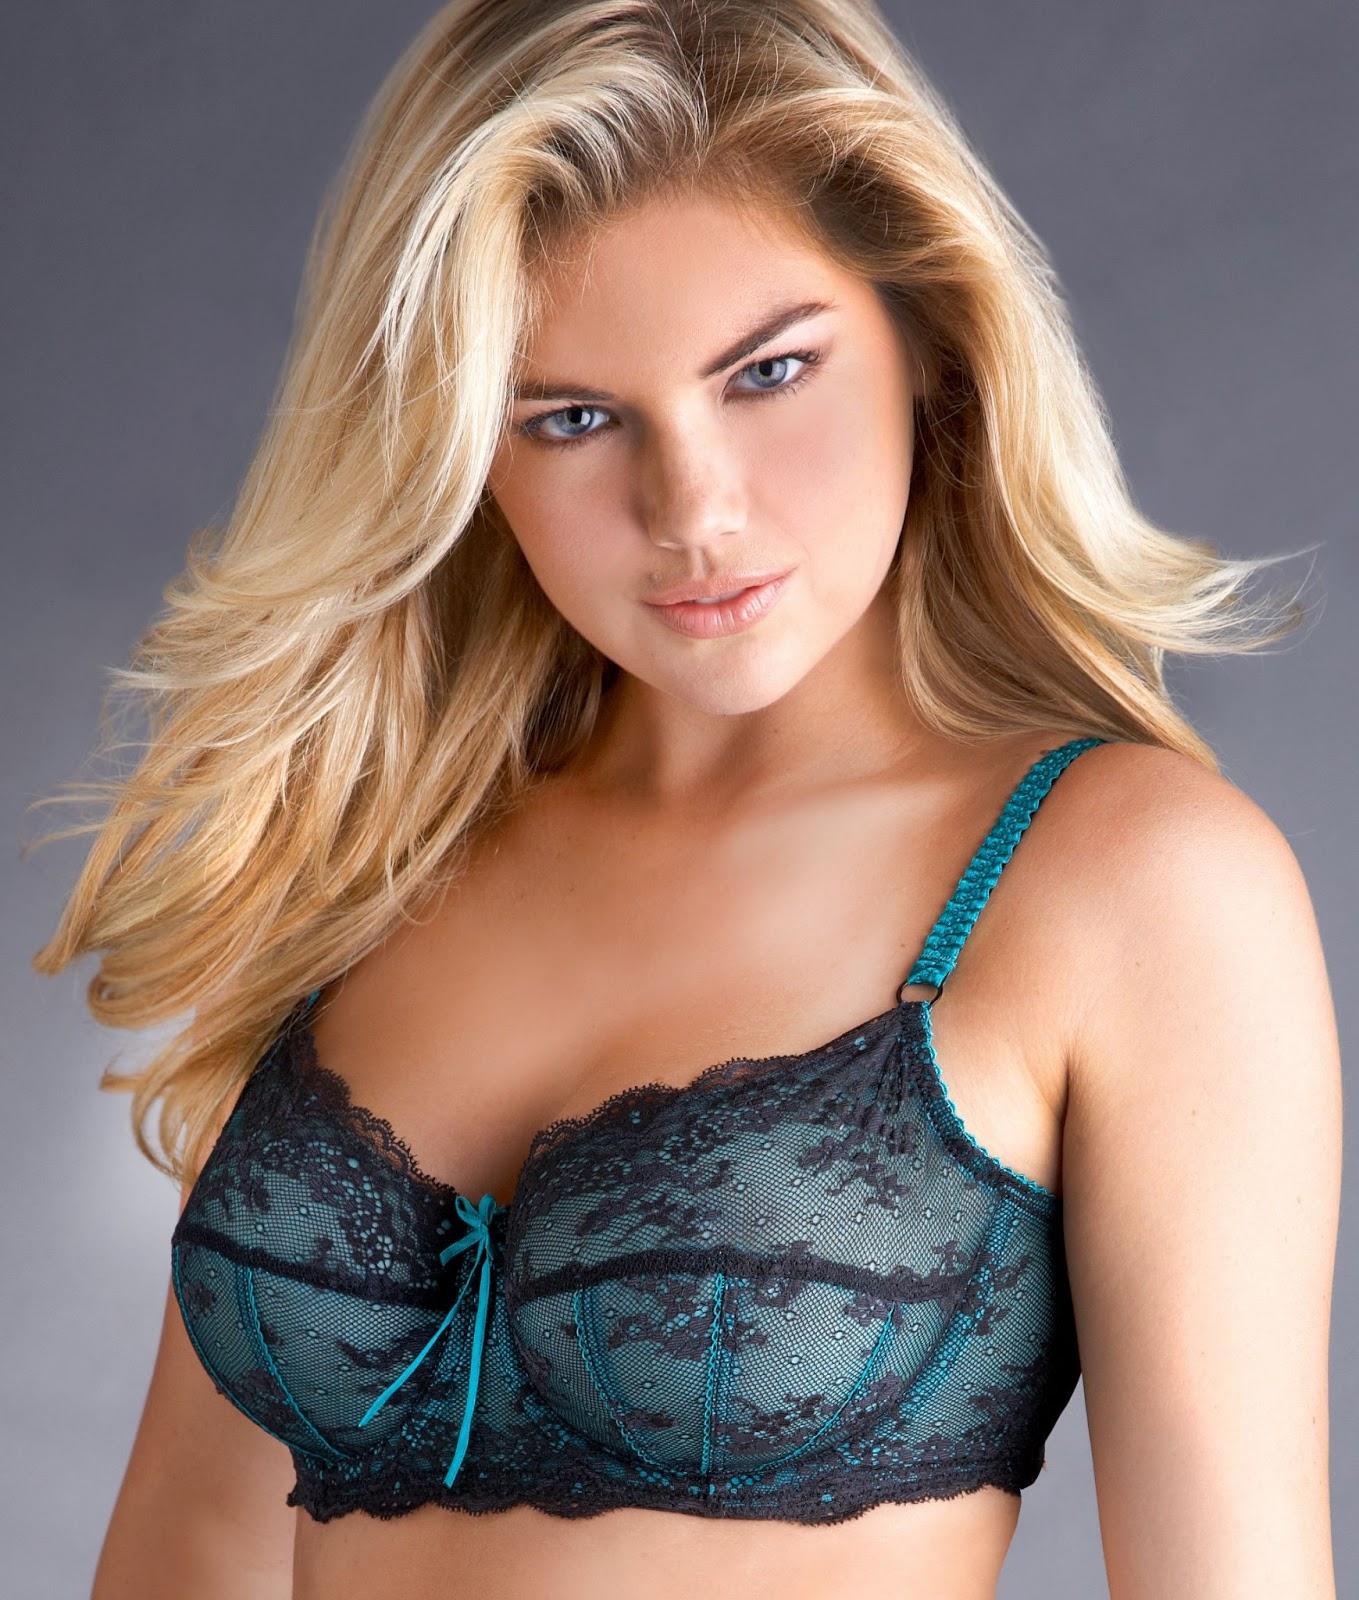 http://1.bp.blogspot.com/-juaVKX6E0yo/UVU8QTnAYxI/AAAAAAAAPM4/tpIg4ZMOisU/s1600/Sexy+Kate+Upton+in+Bare+Necessities+(1).jpg